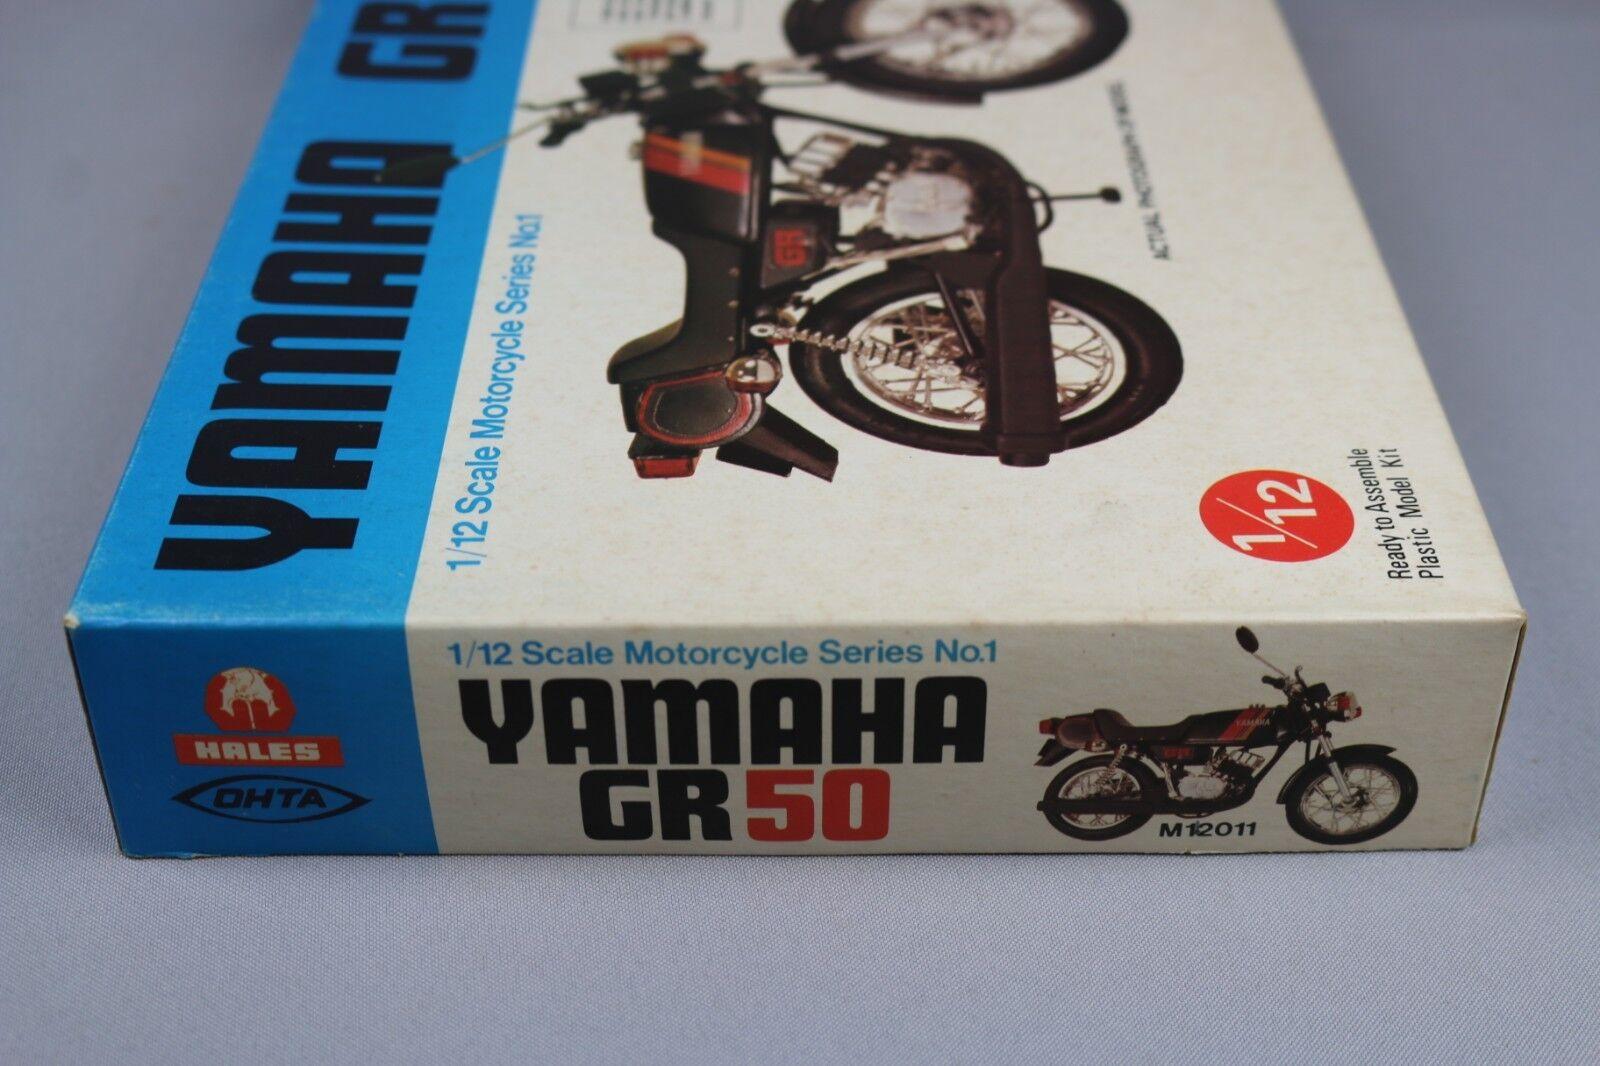 Zf1031 Hales Ohta 1 12 Maqueta Moto M12011 Yamaha Gr50 Gr50 Gr50 2 Strokes Serie No. 1 50c952